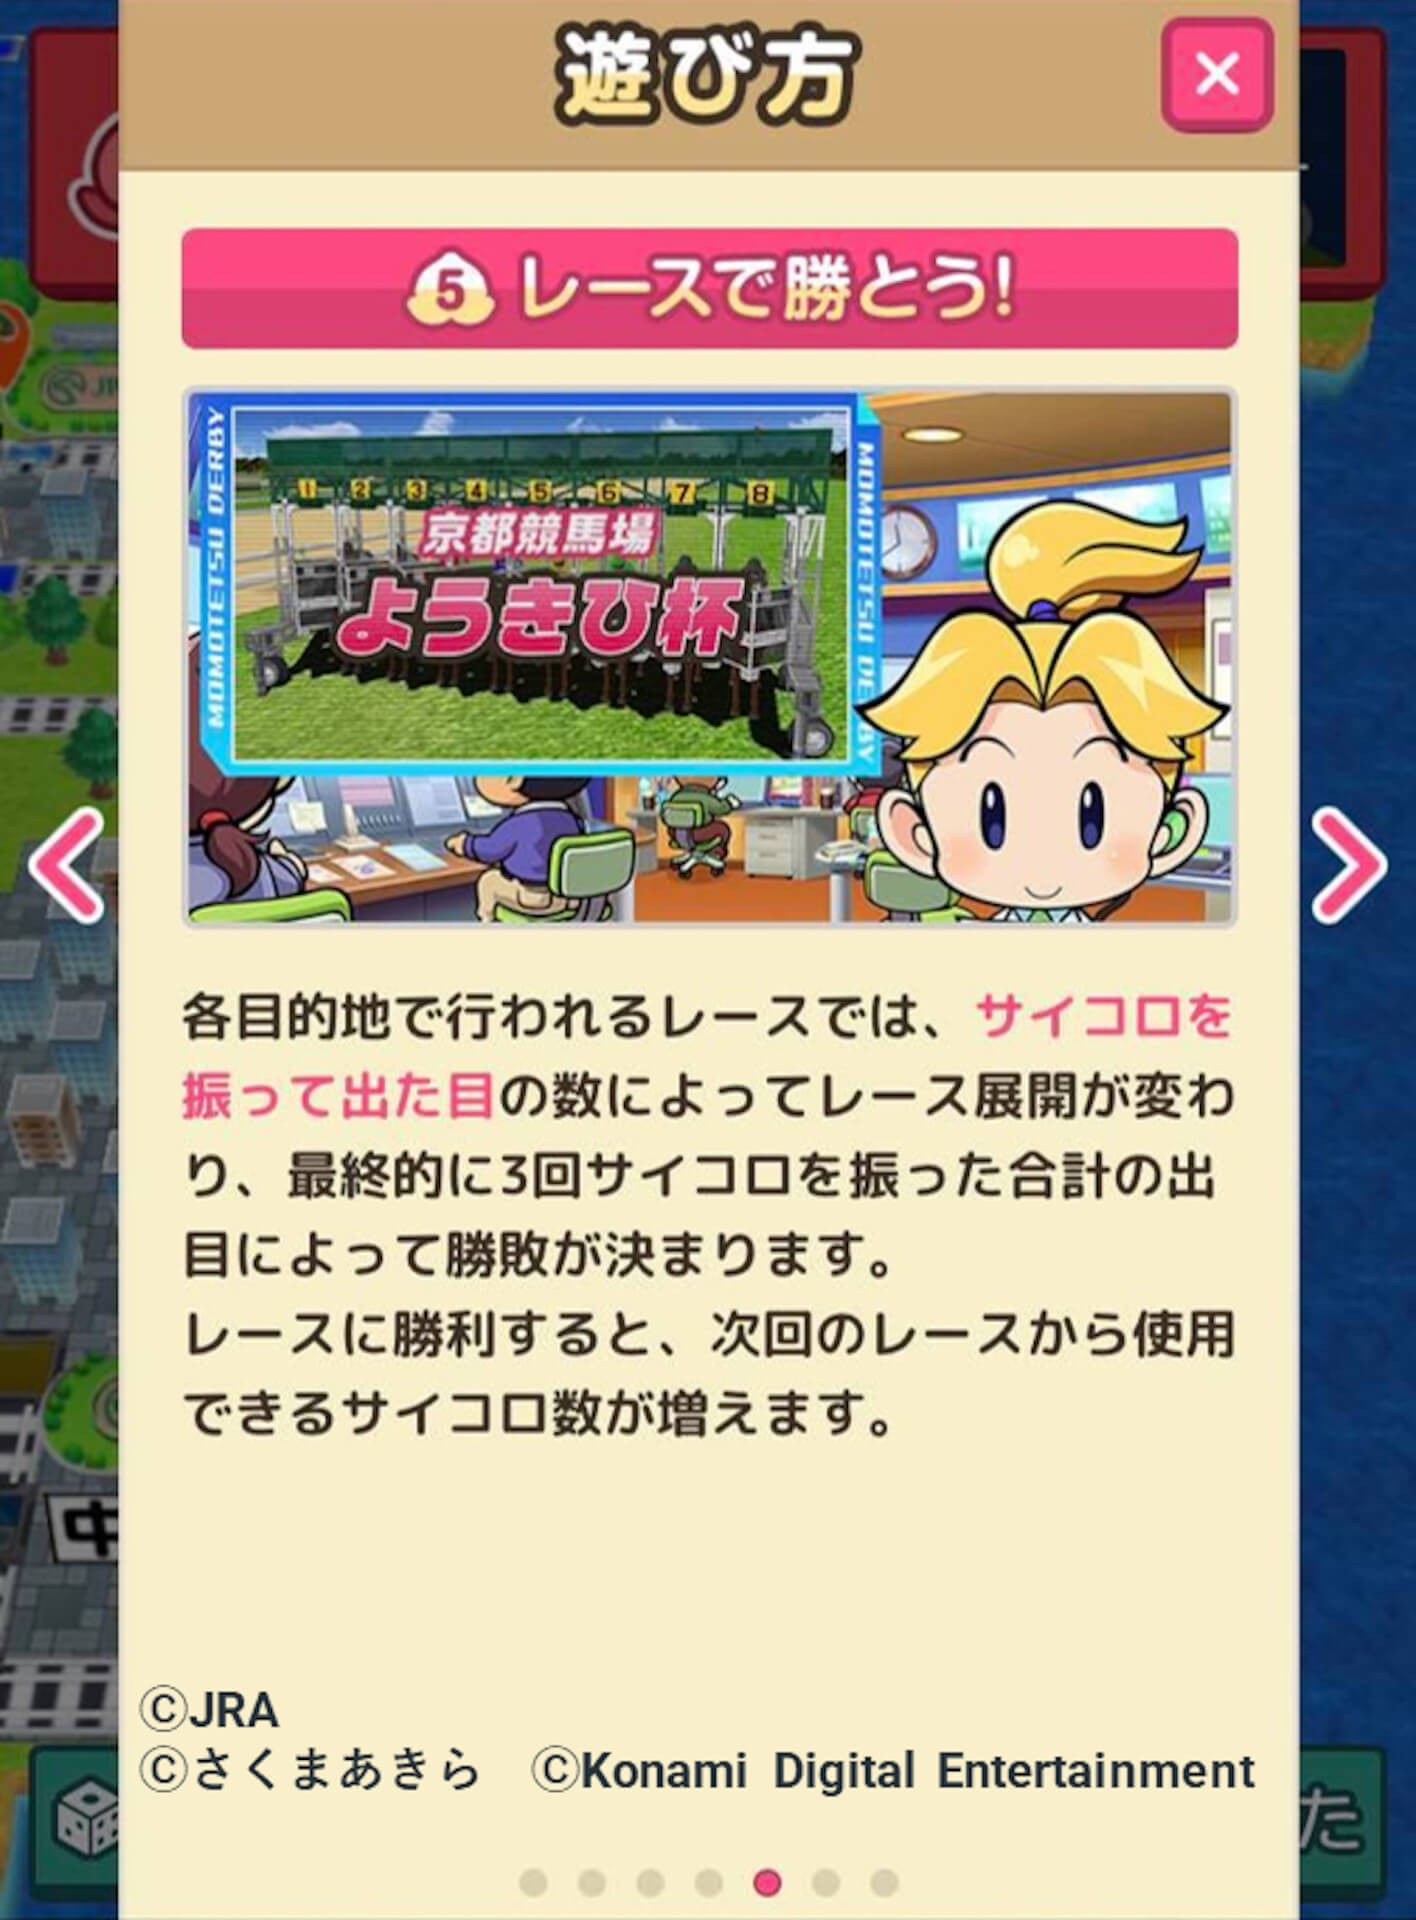 JRAと桃太郎電鉄が日本ダービーでコラボ!1万円分の電子マネーギフトが当たるTwitterキャンペーンも実施 tech210517_jra-momotetsu-210517_7